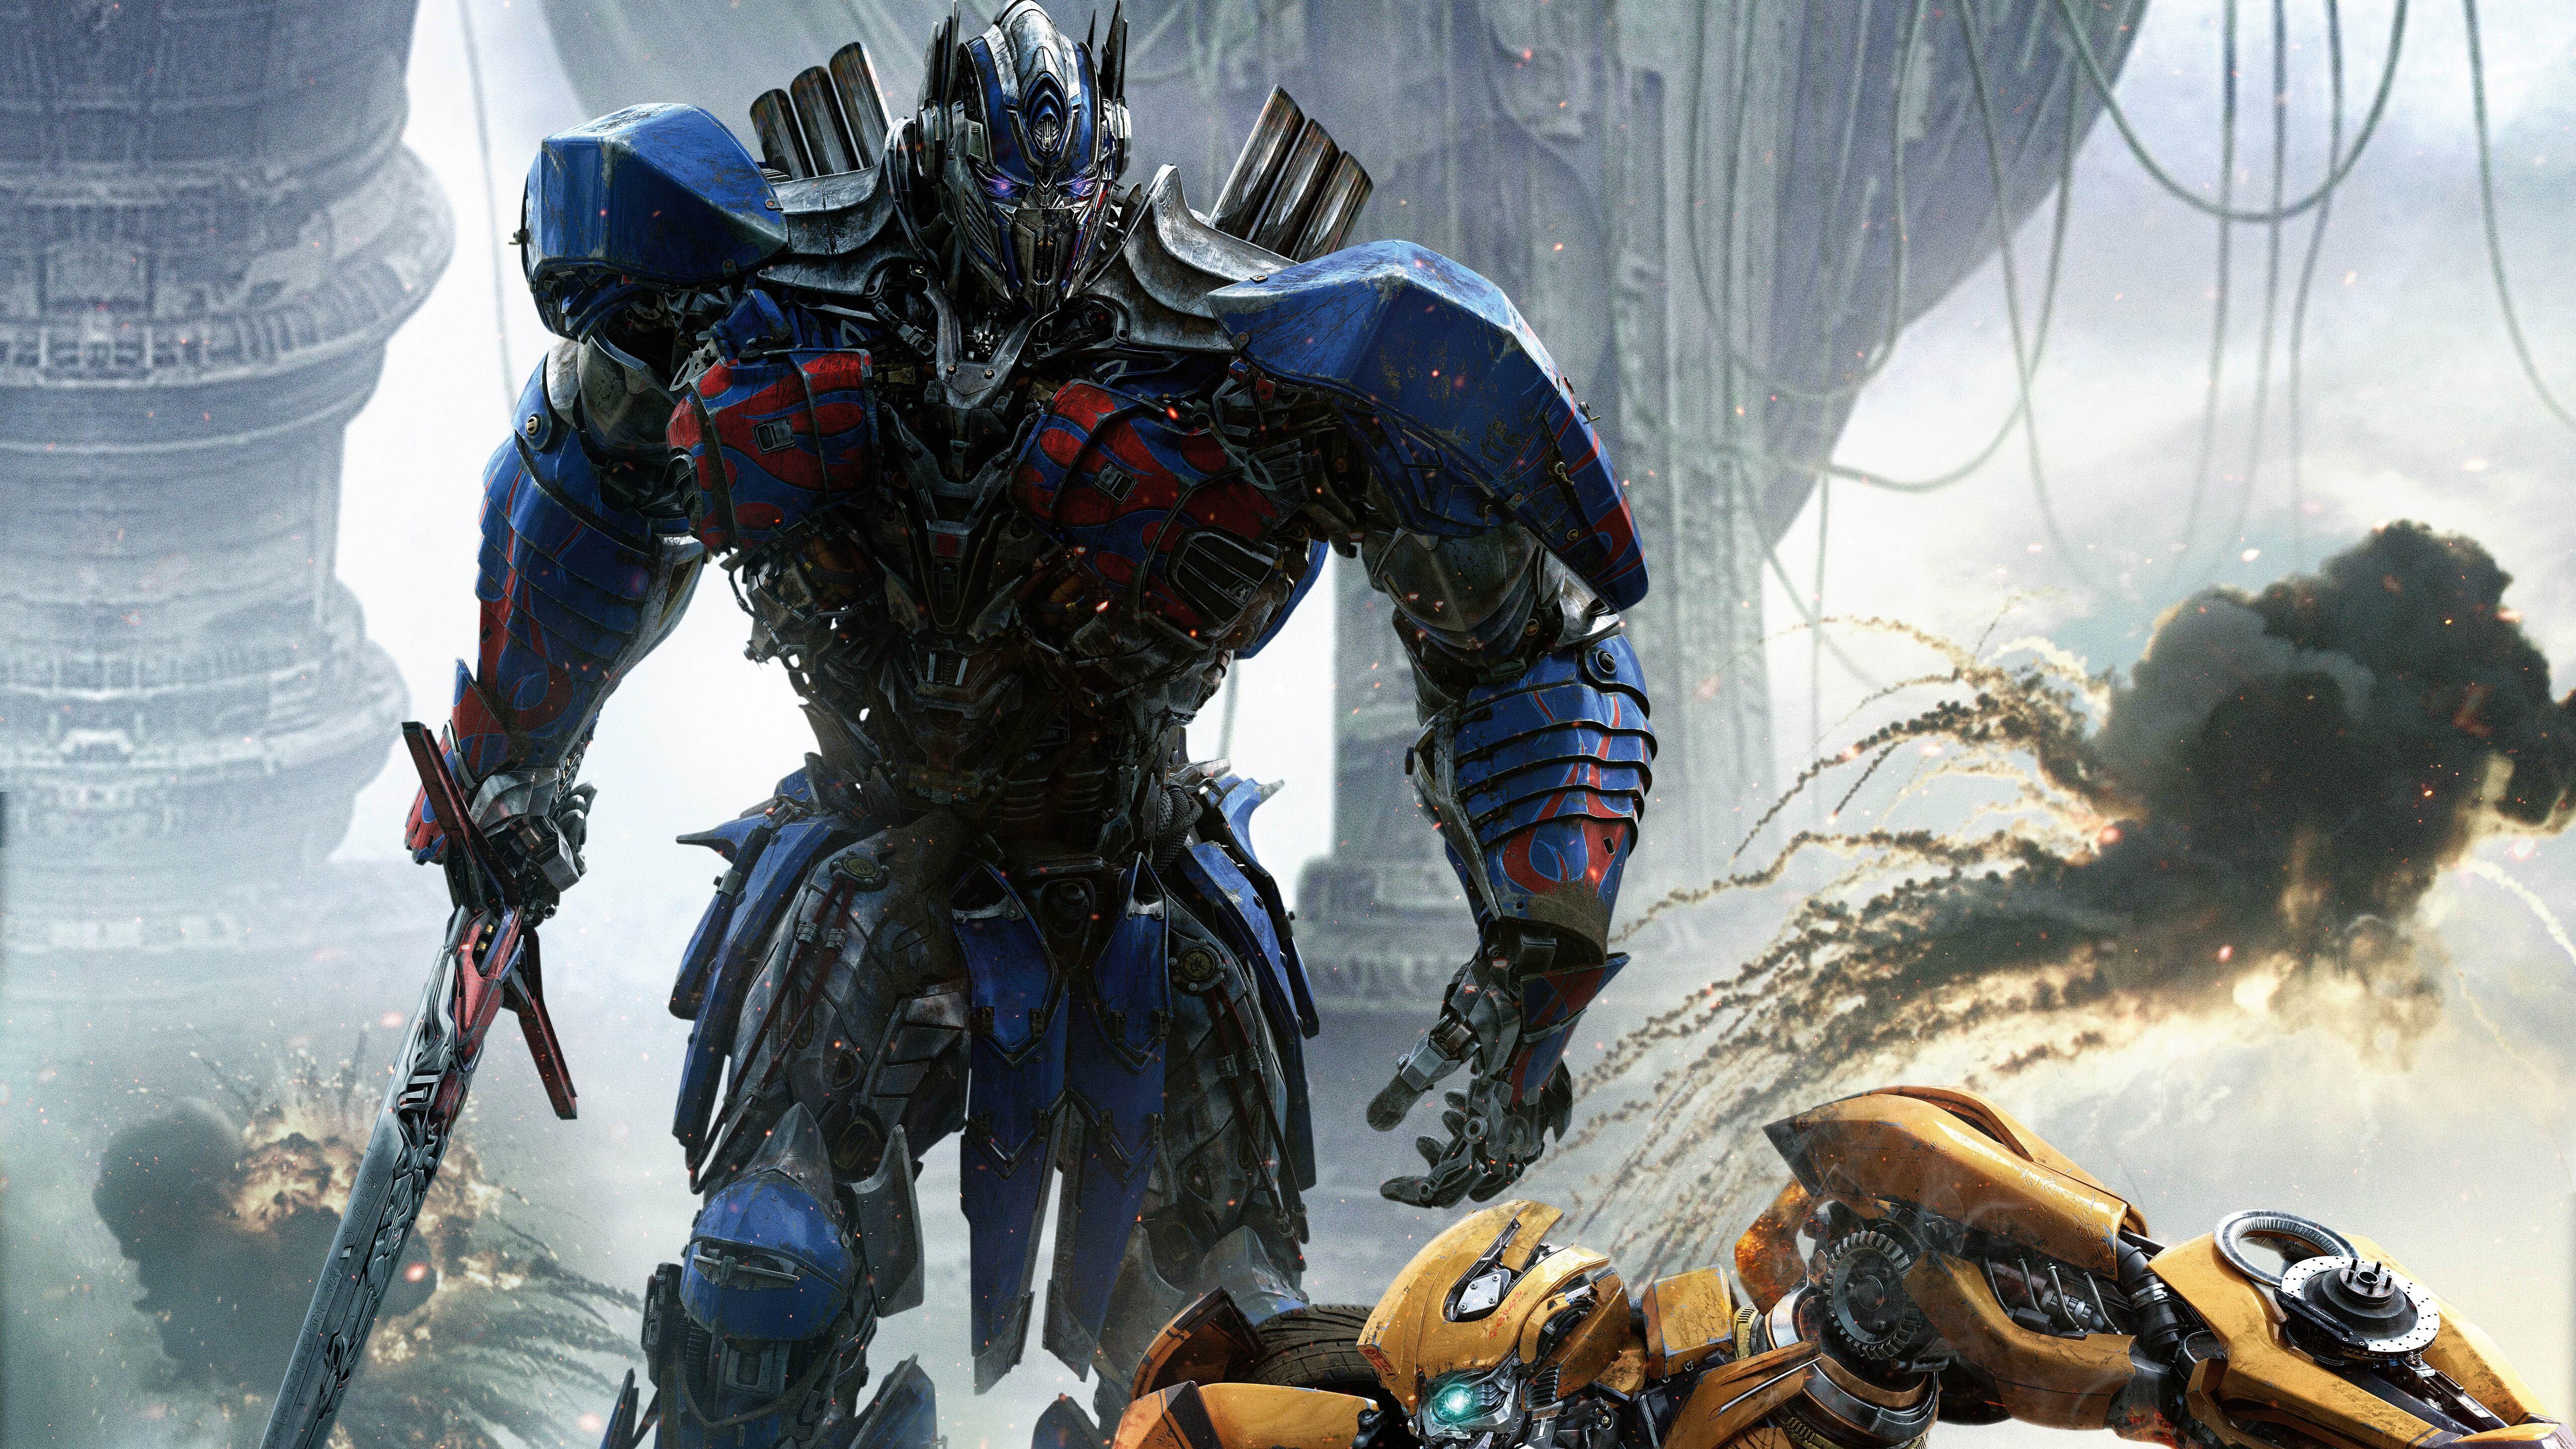 5120x2880 Optimus Prime Transformers The Last Knight 5k Hd 4k